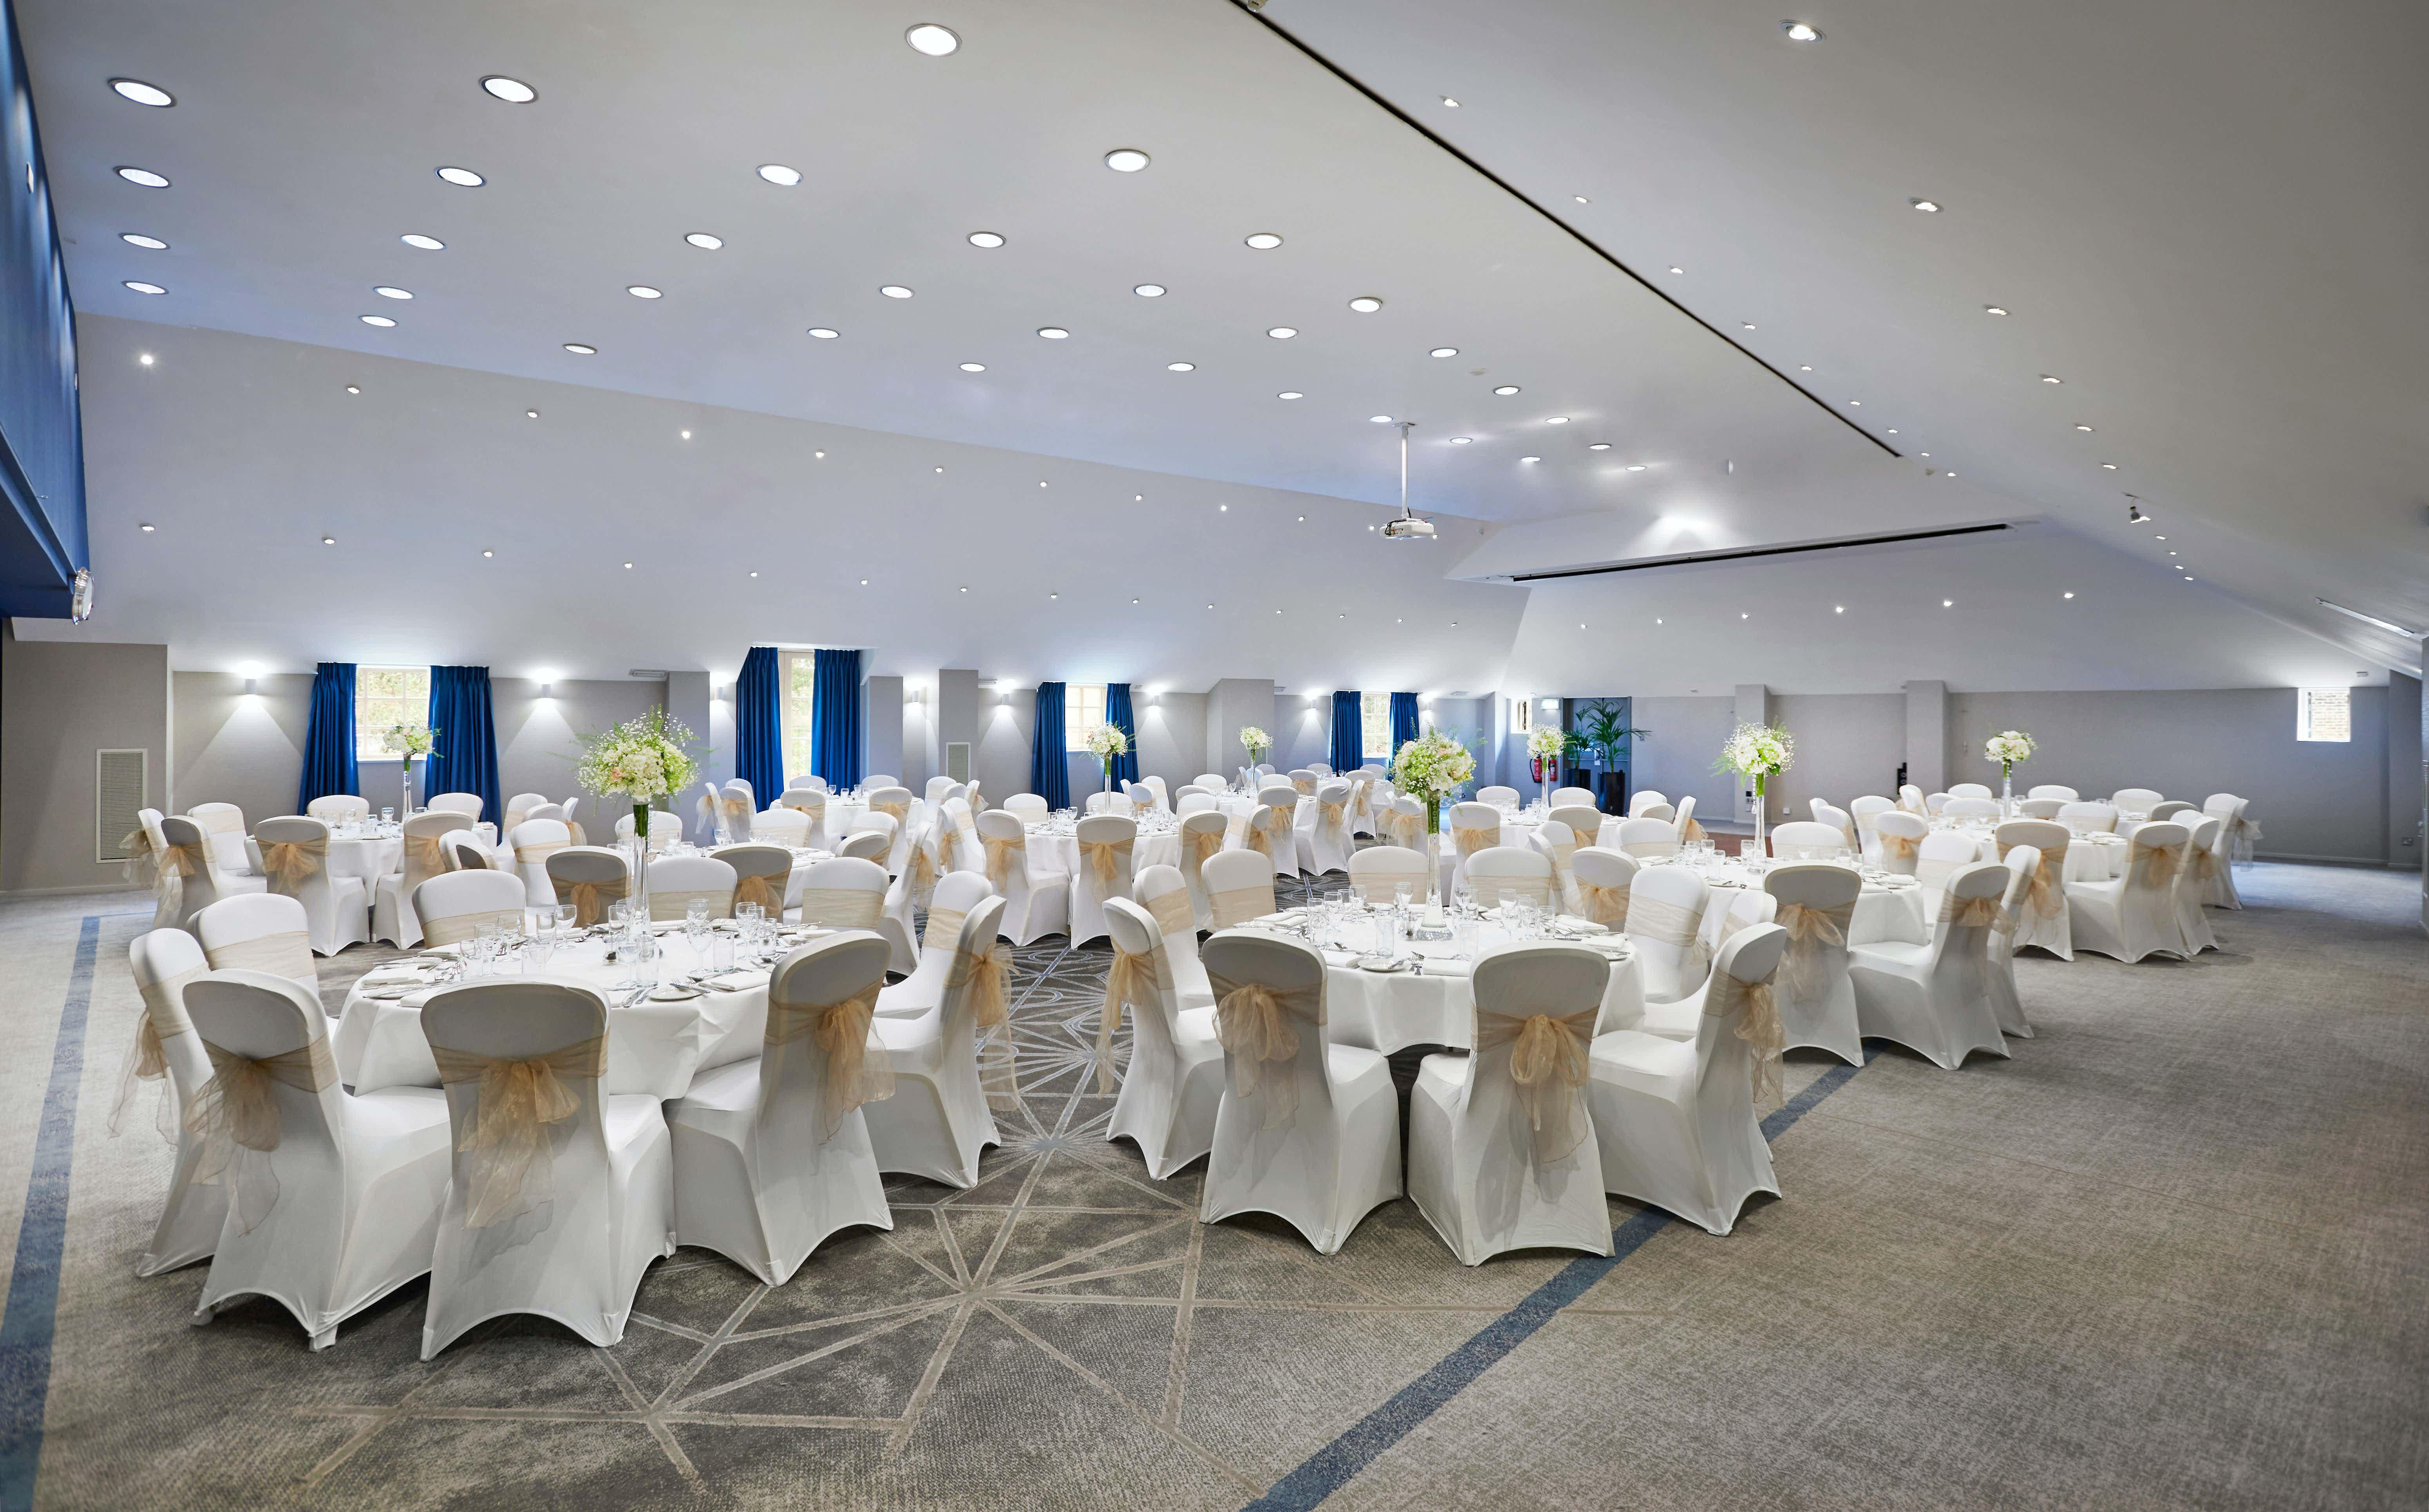 London Room, Hilton Doubletree Docklands